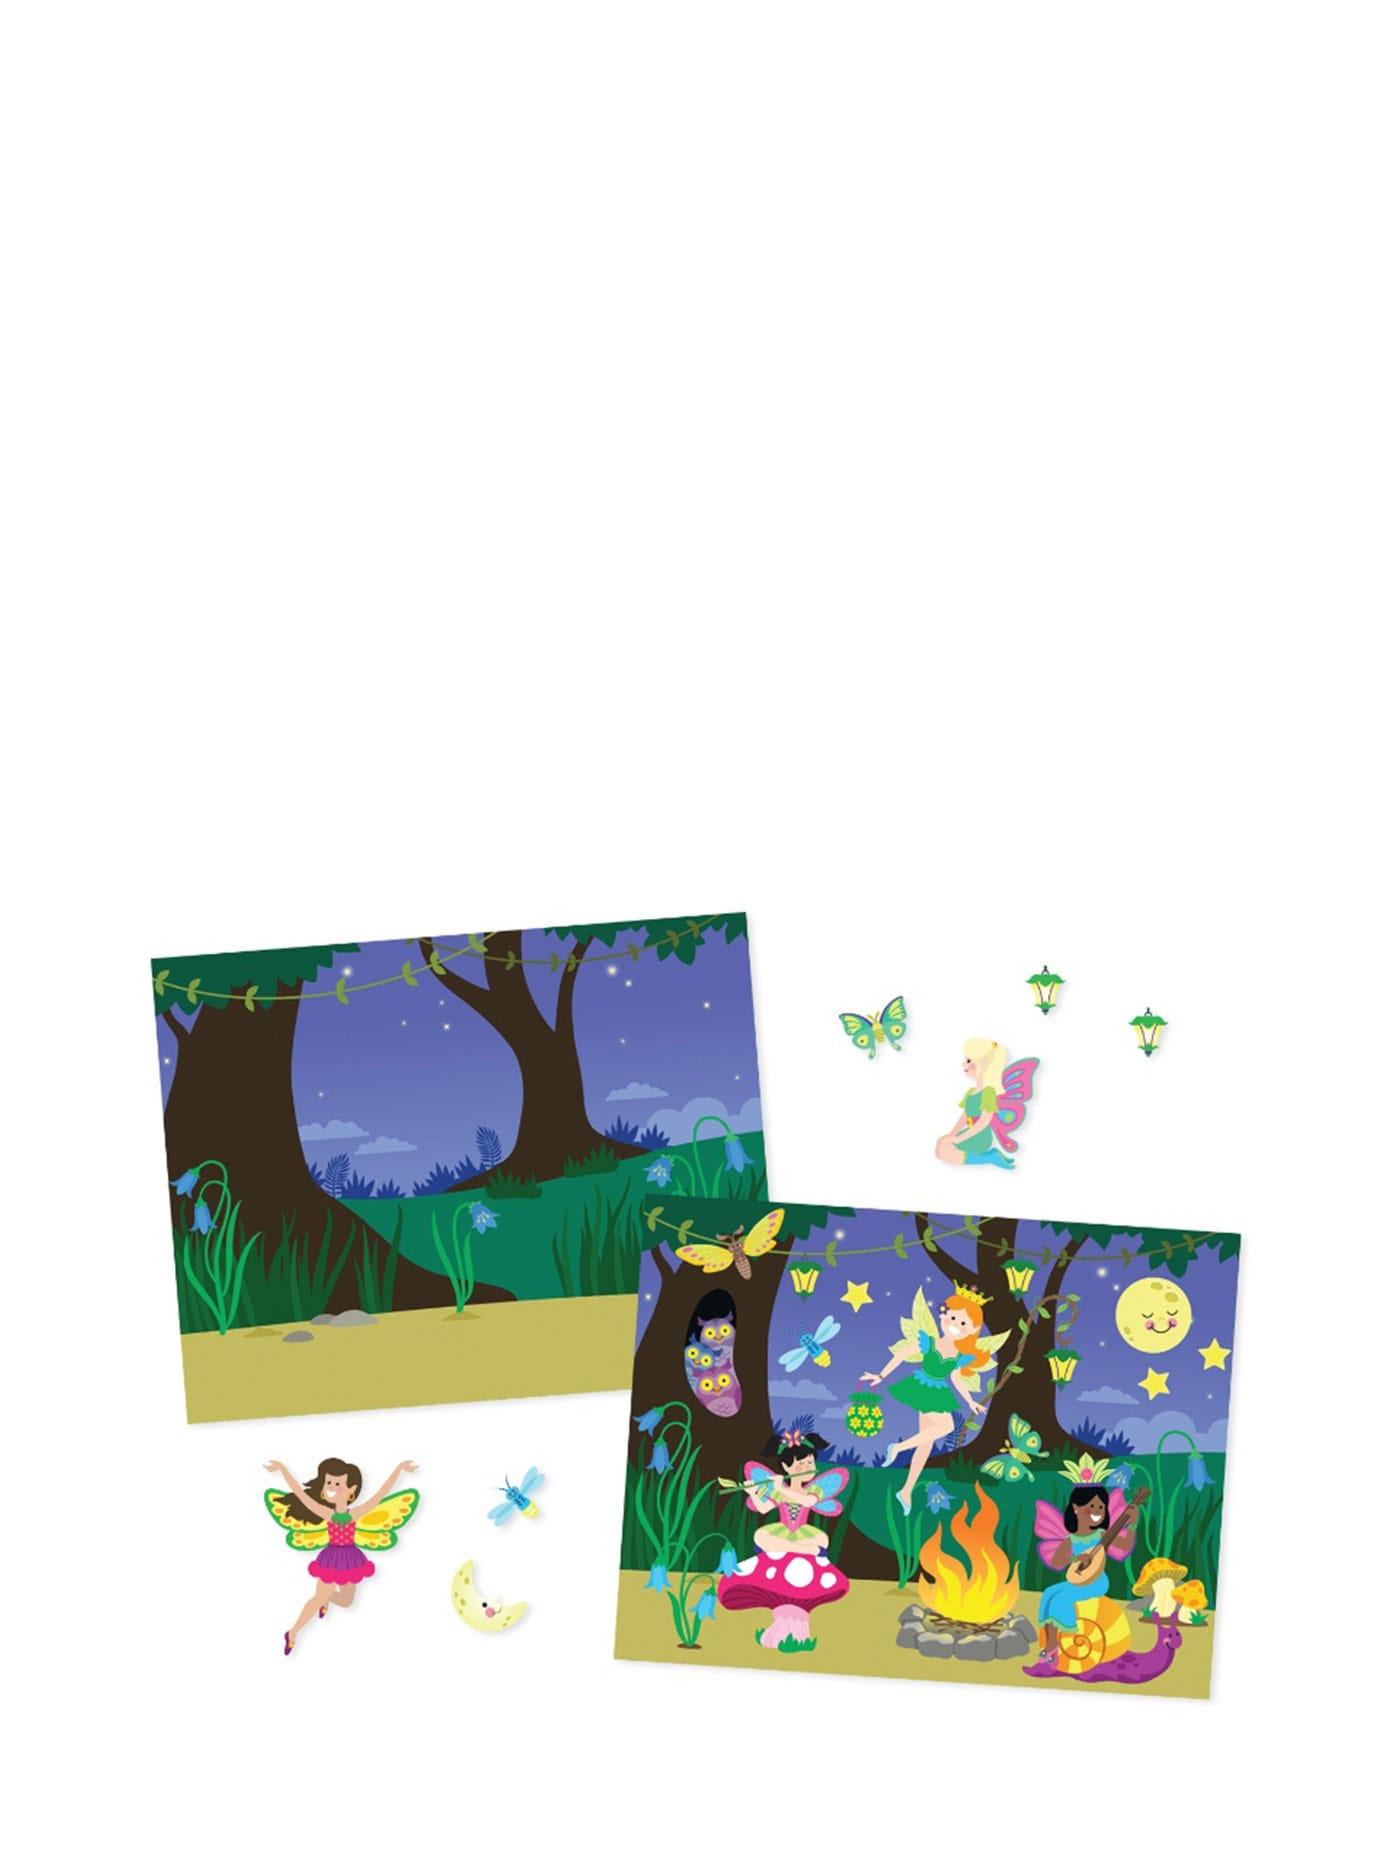 Melissa Doug Reusable Sticker Pad Fairies 8603 Central